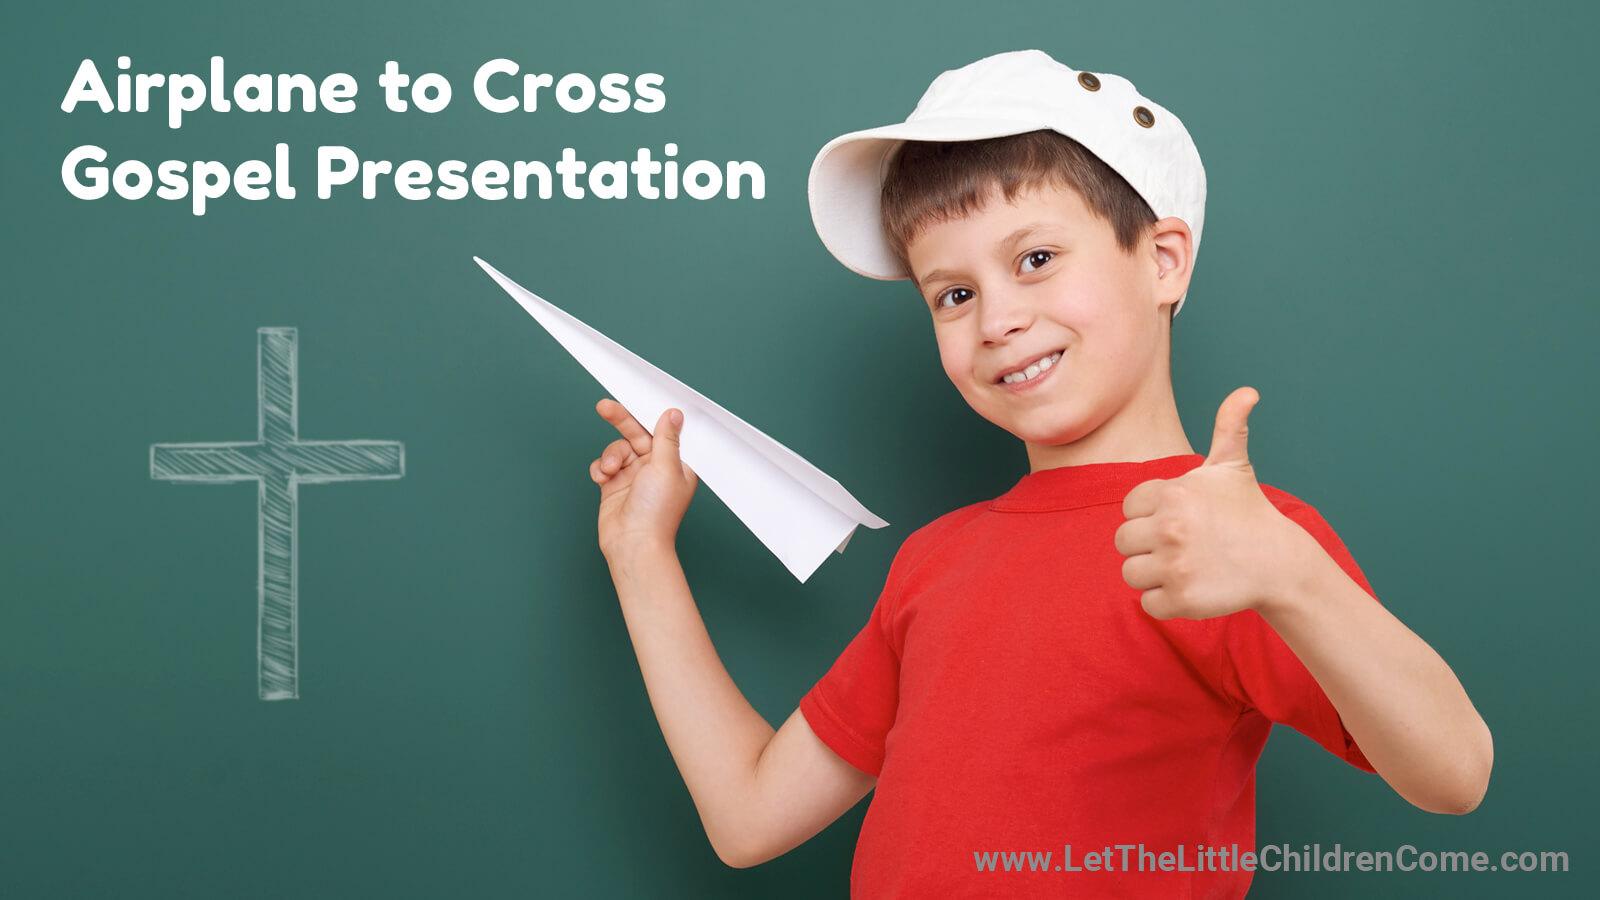 Airplane to Cross Gospel Presentation